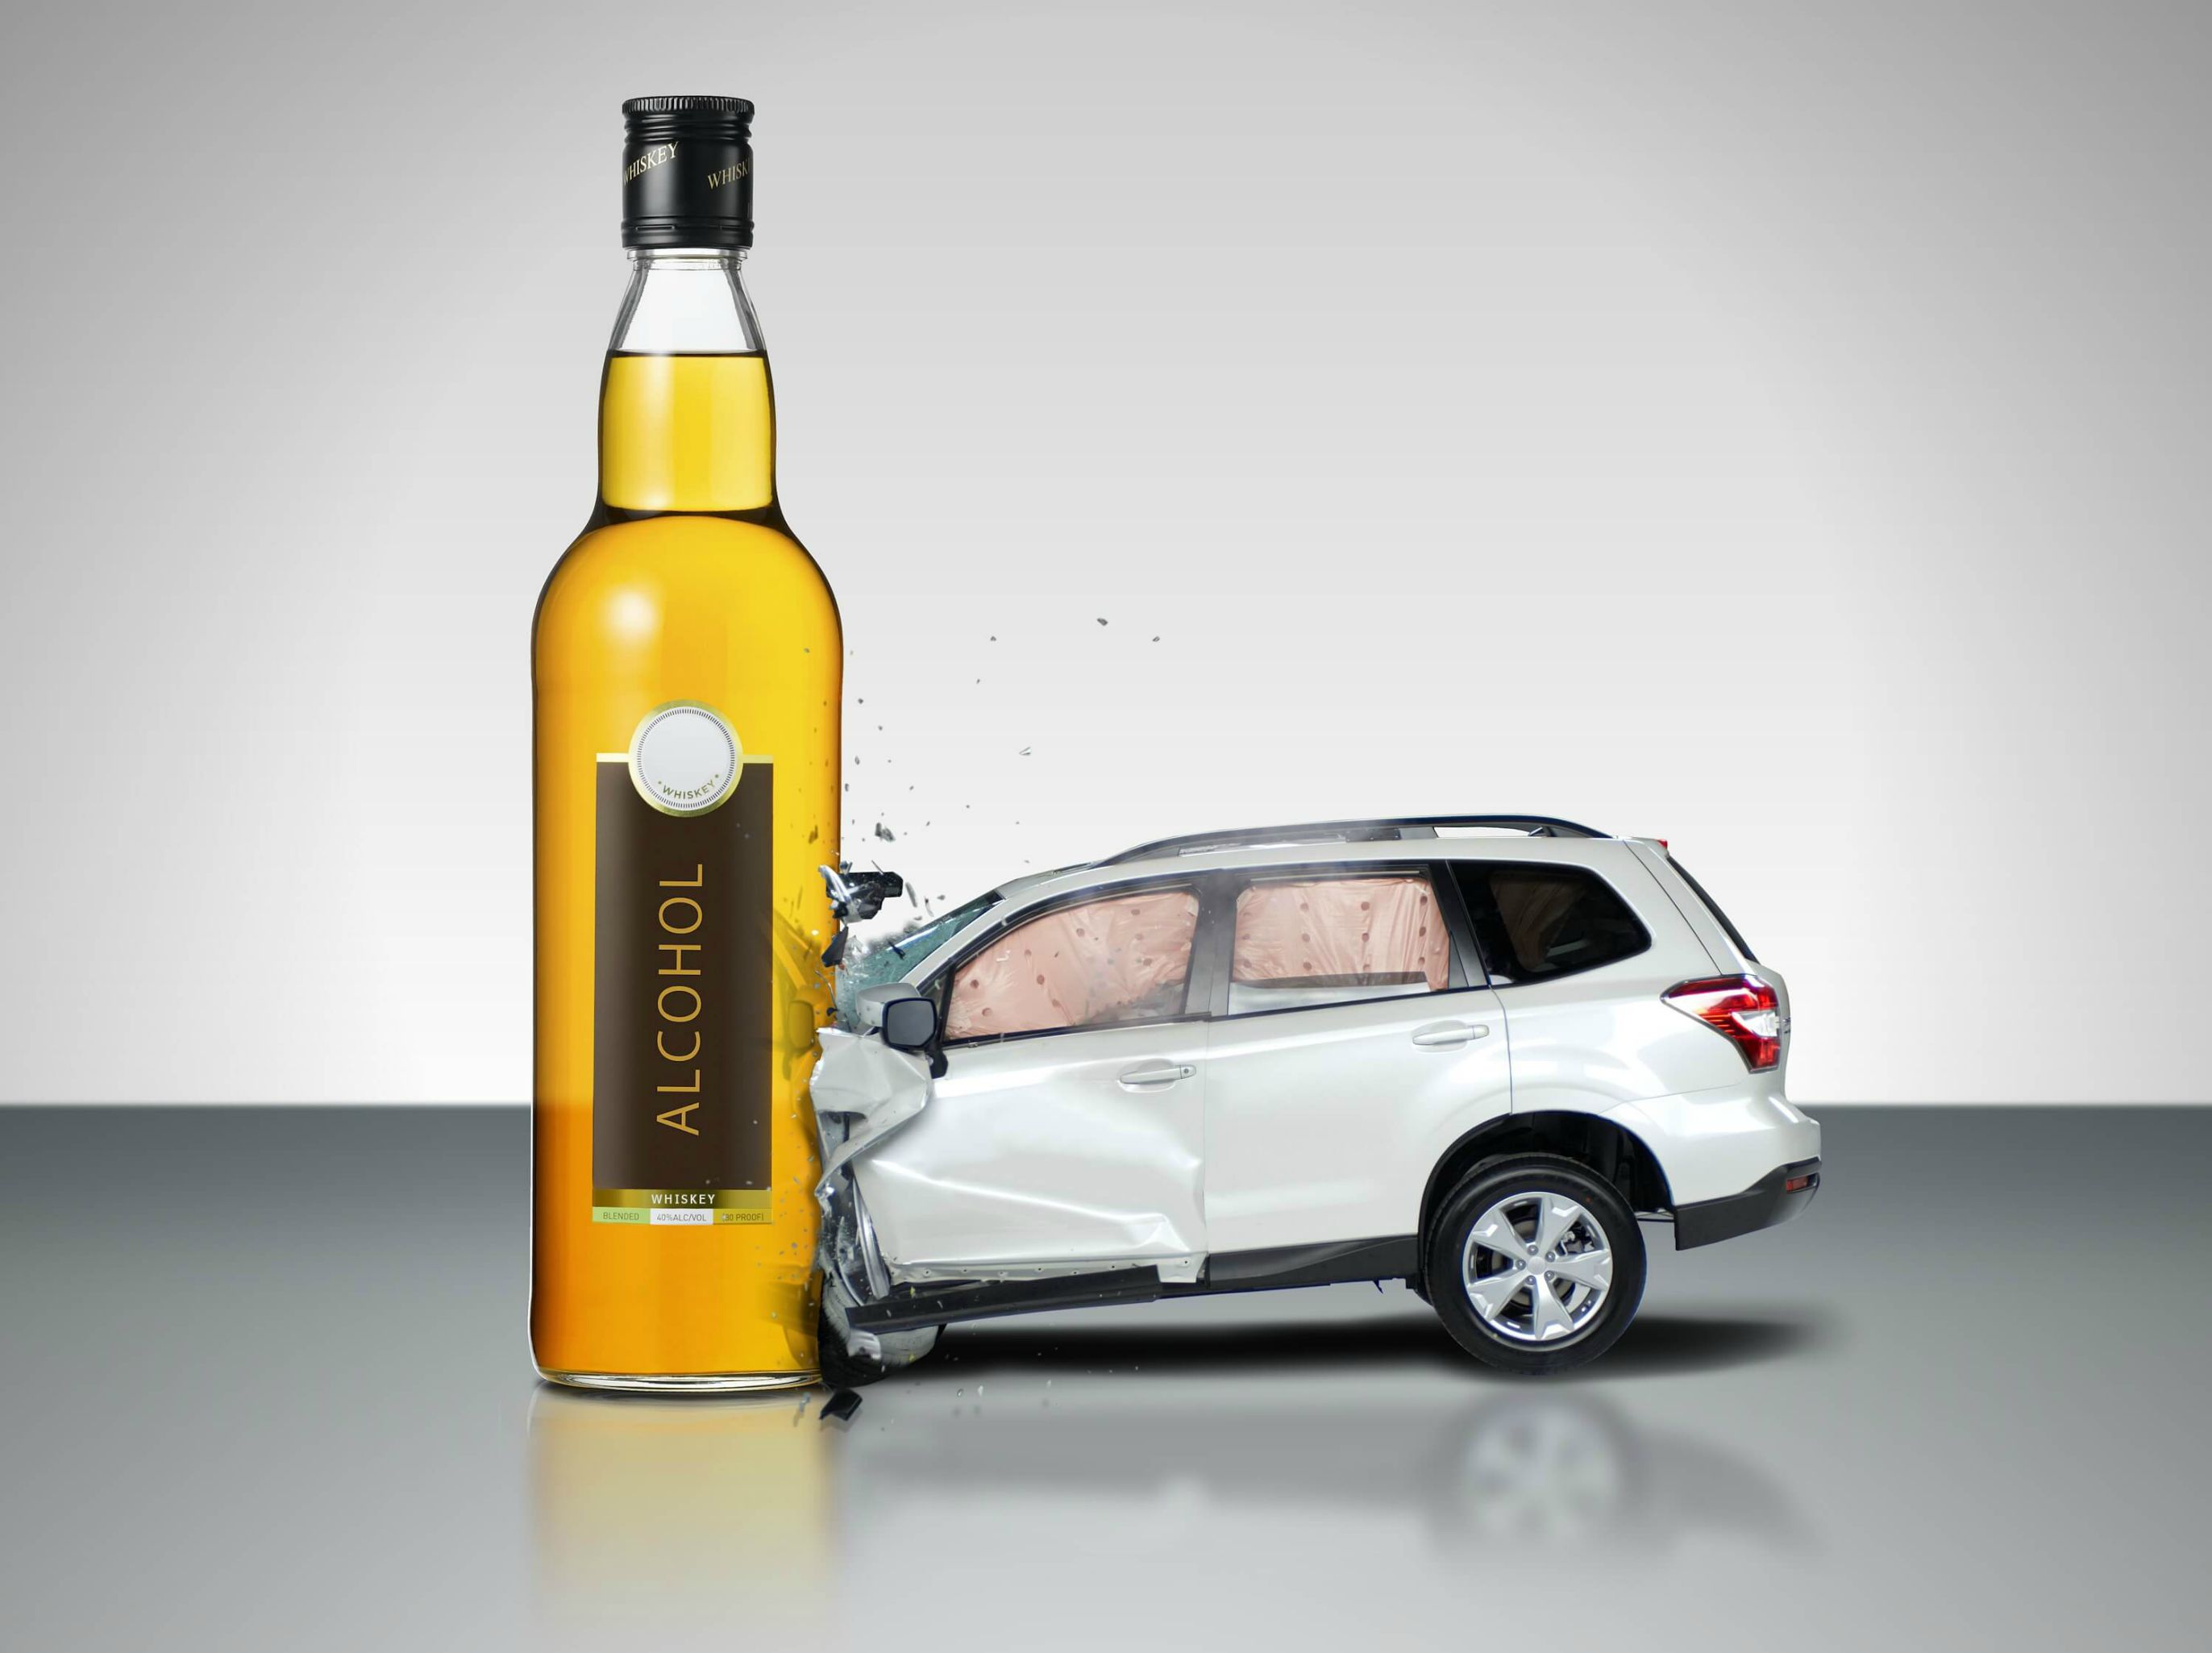 Drinking Drunk Driving